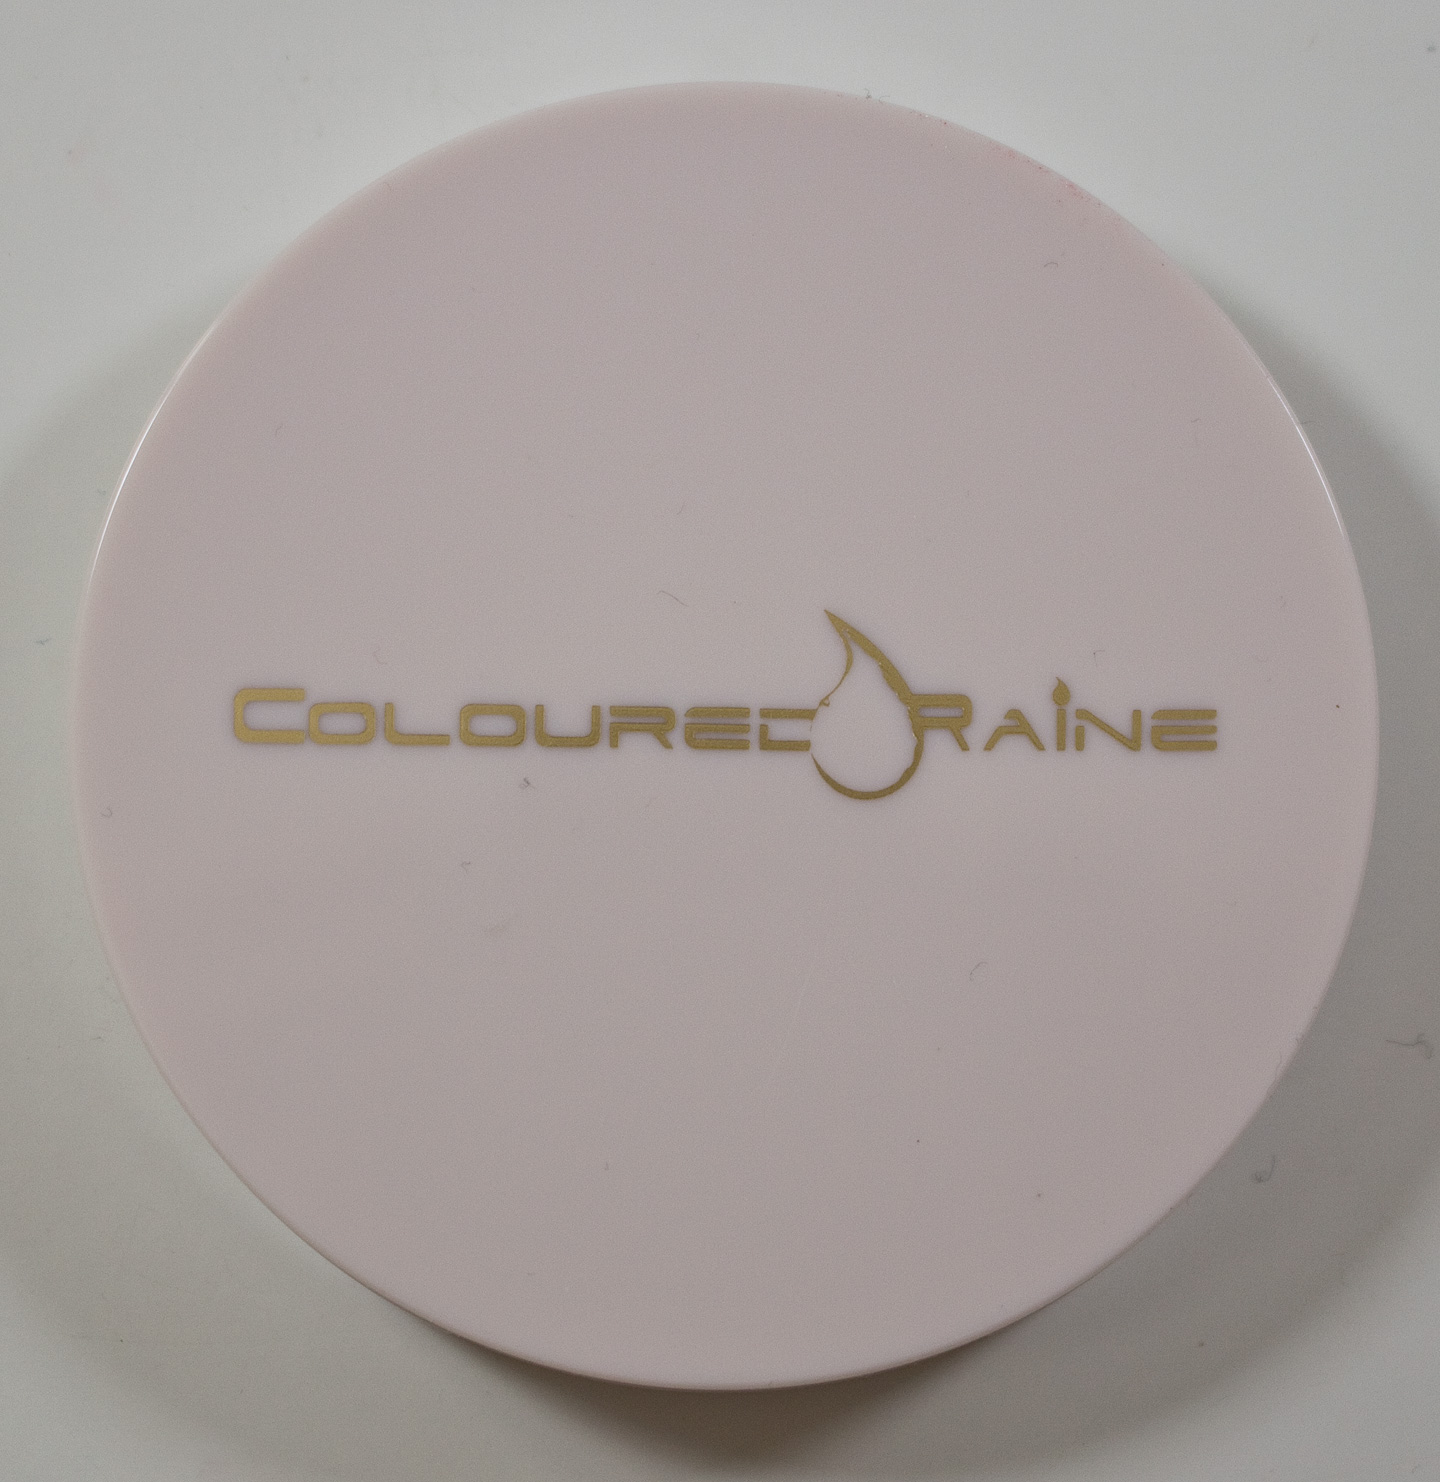 Coloured Raine Fashion Show